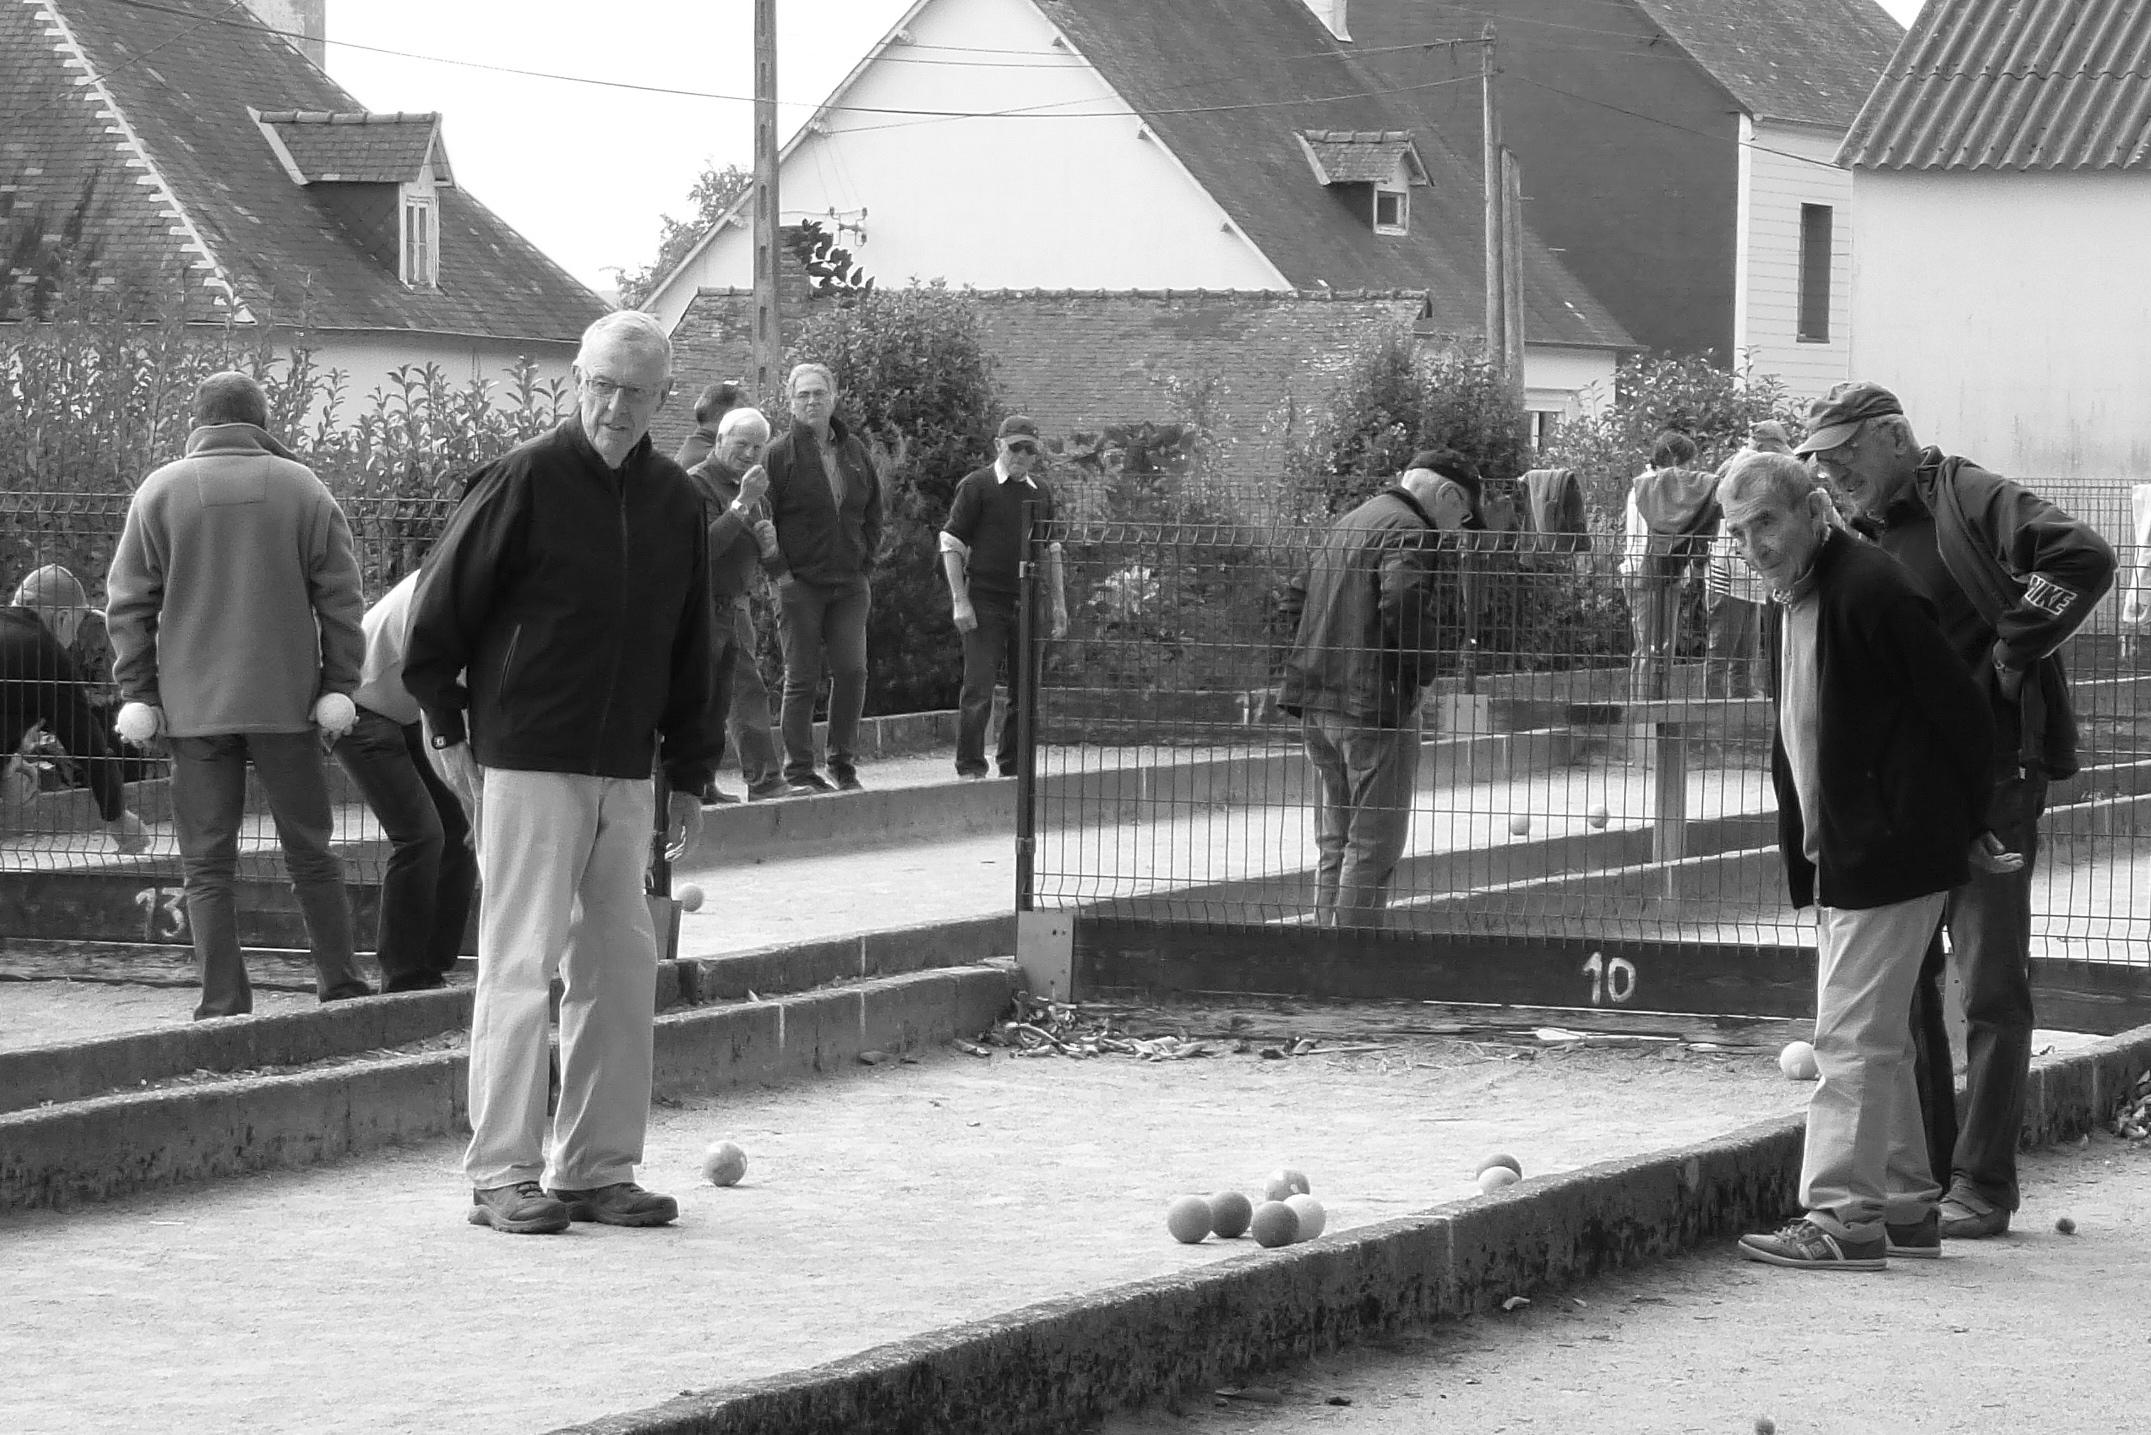 Boules Bretagne on the old railway.